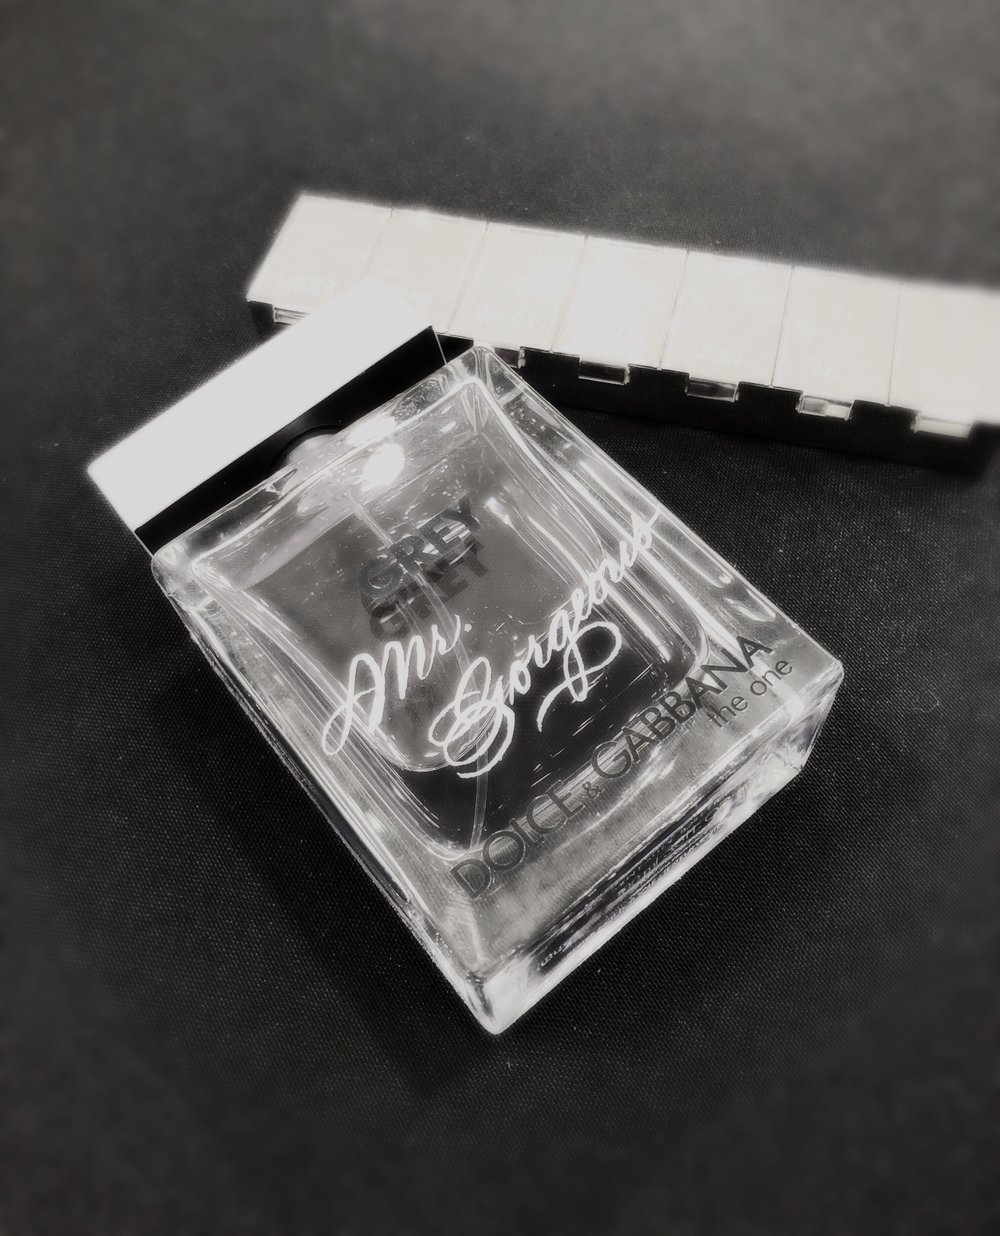 Houston fragrance perfume cosmetic makeup engraving dolce gabbana.jpg